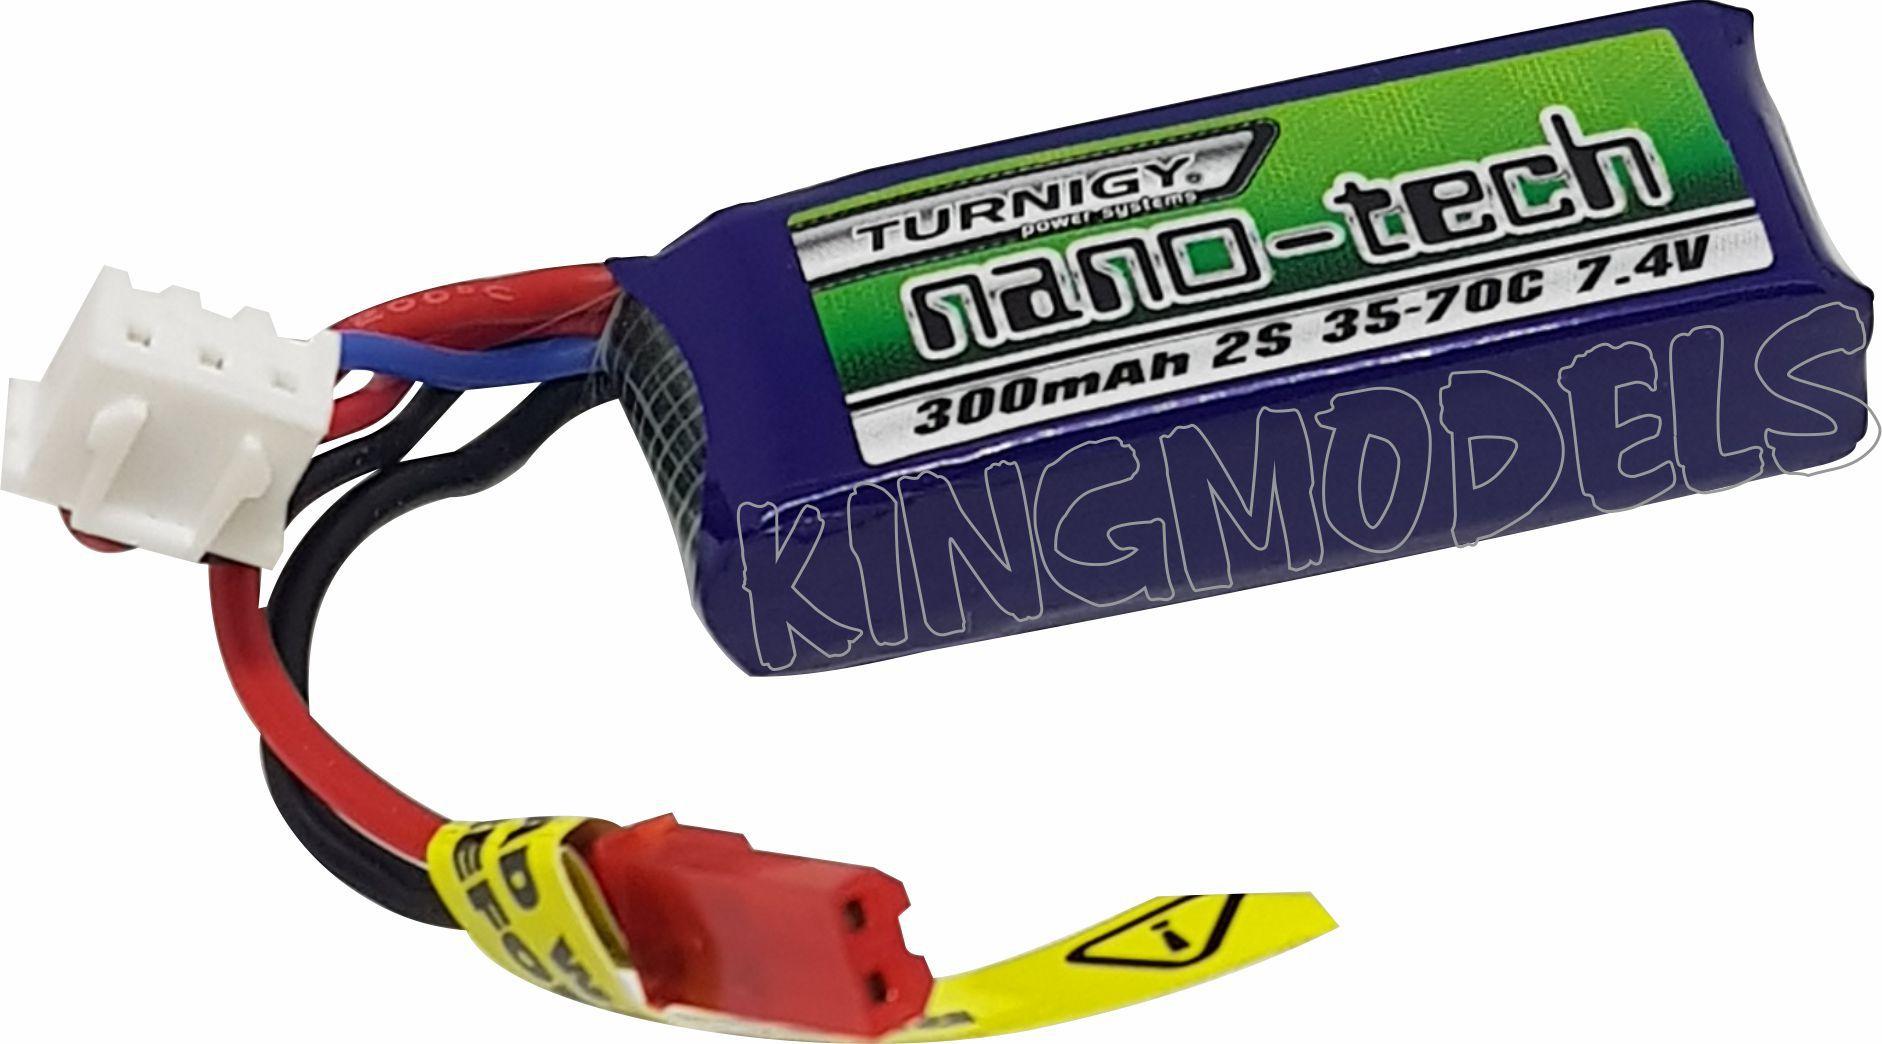 Lipo Nano Tech 2s - 7,4v - 300mah - 35/70c Airsoft / Aero  - King Models